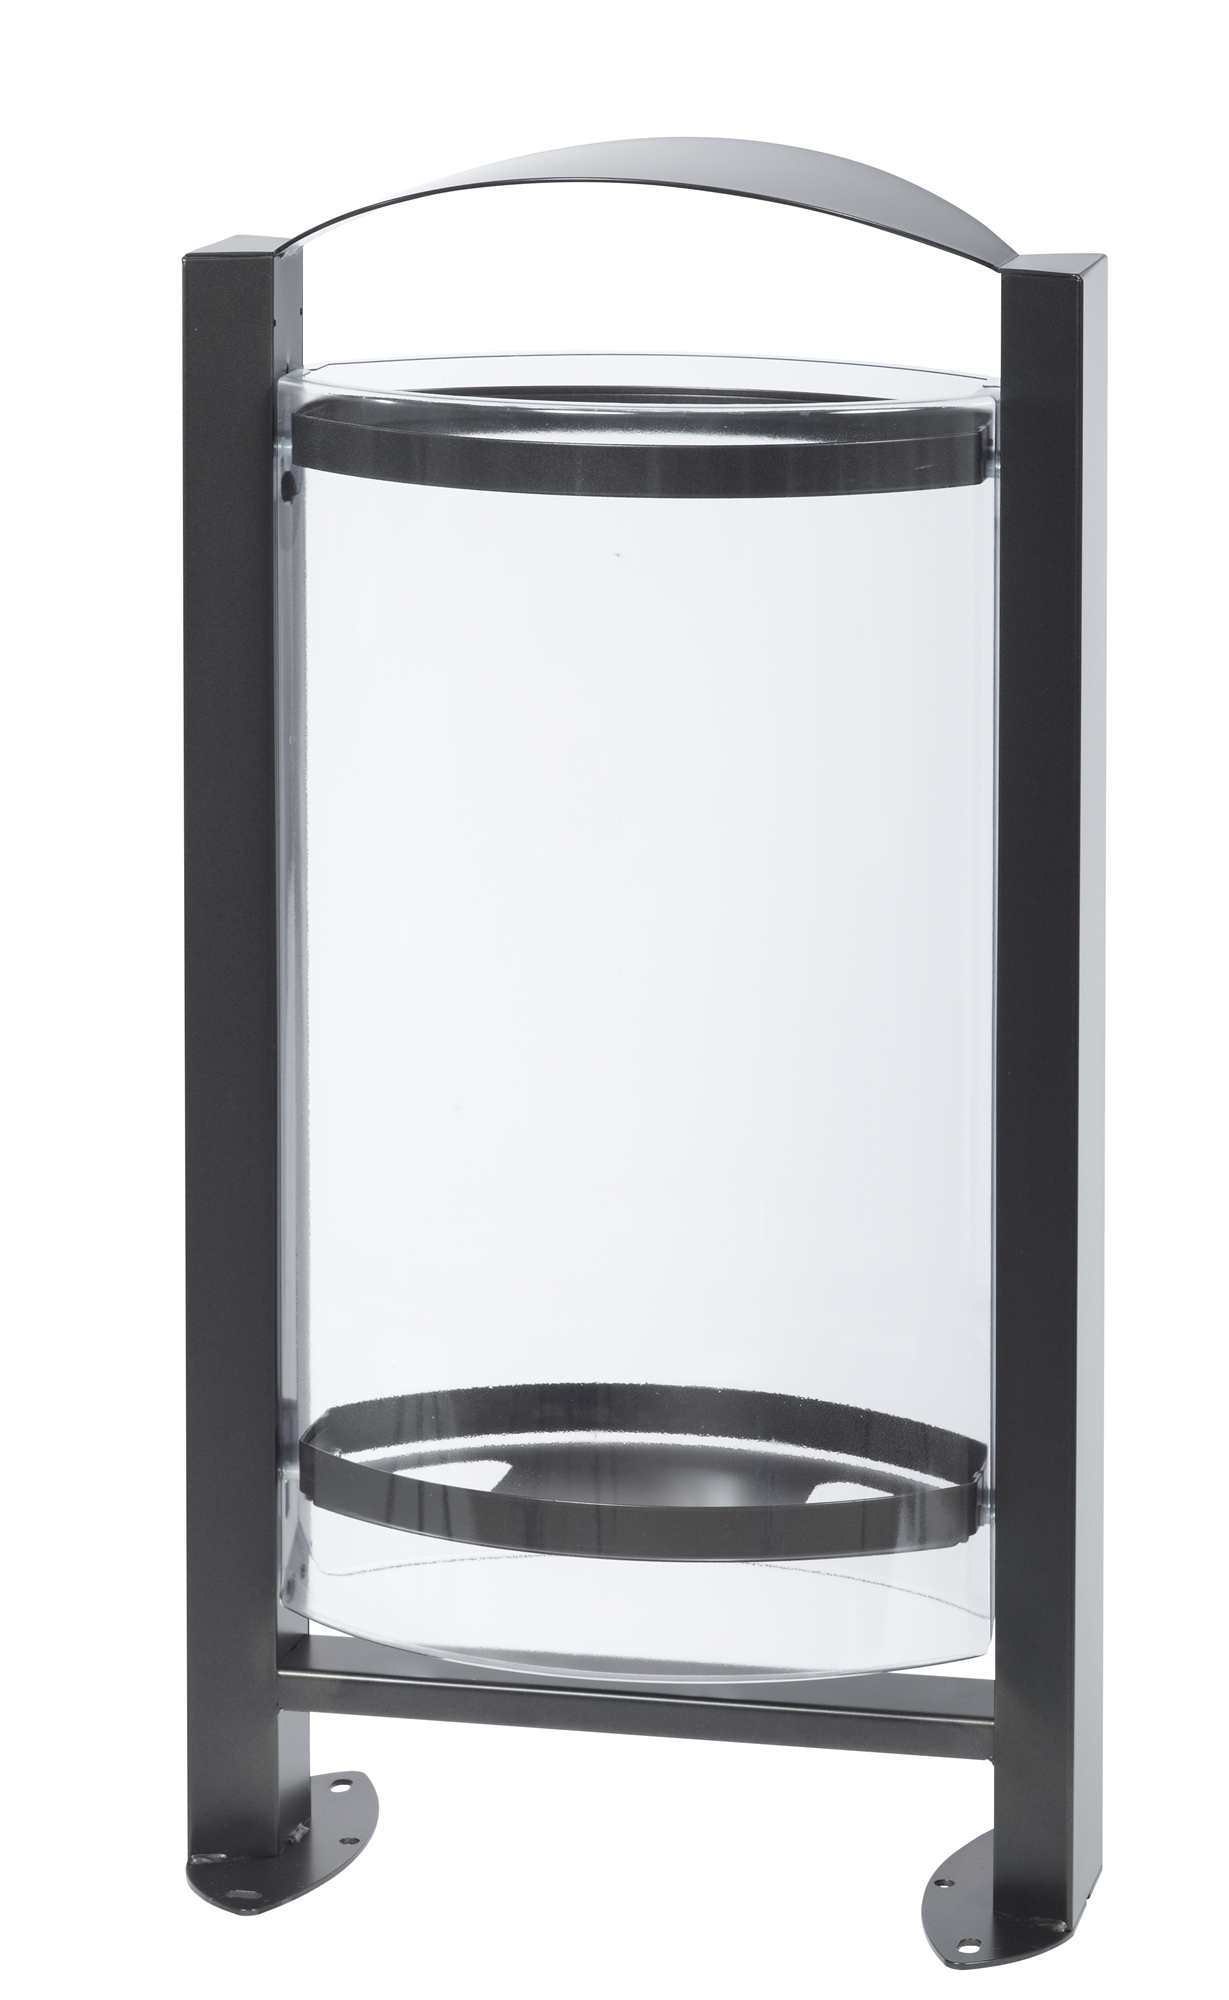 poubelle exterieure vigipirate rossignol 60l plastique. Black Bedroom Furniture Sets. Home Design Ideas